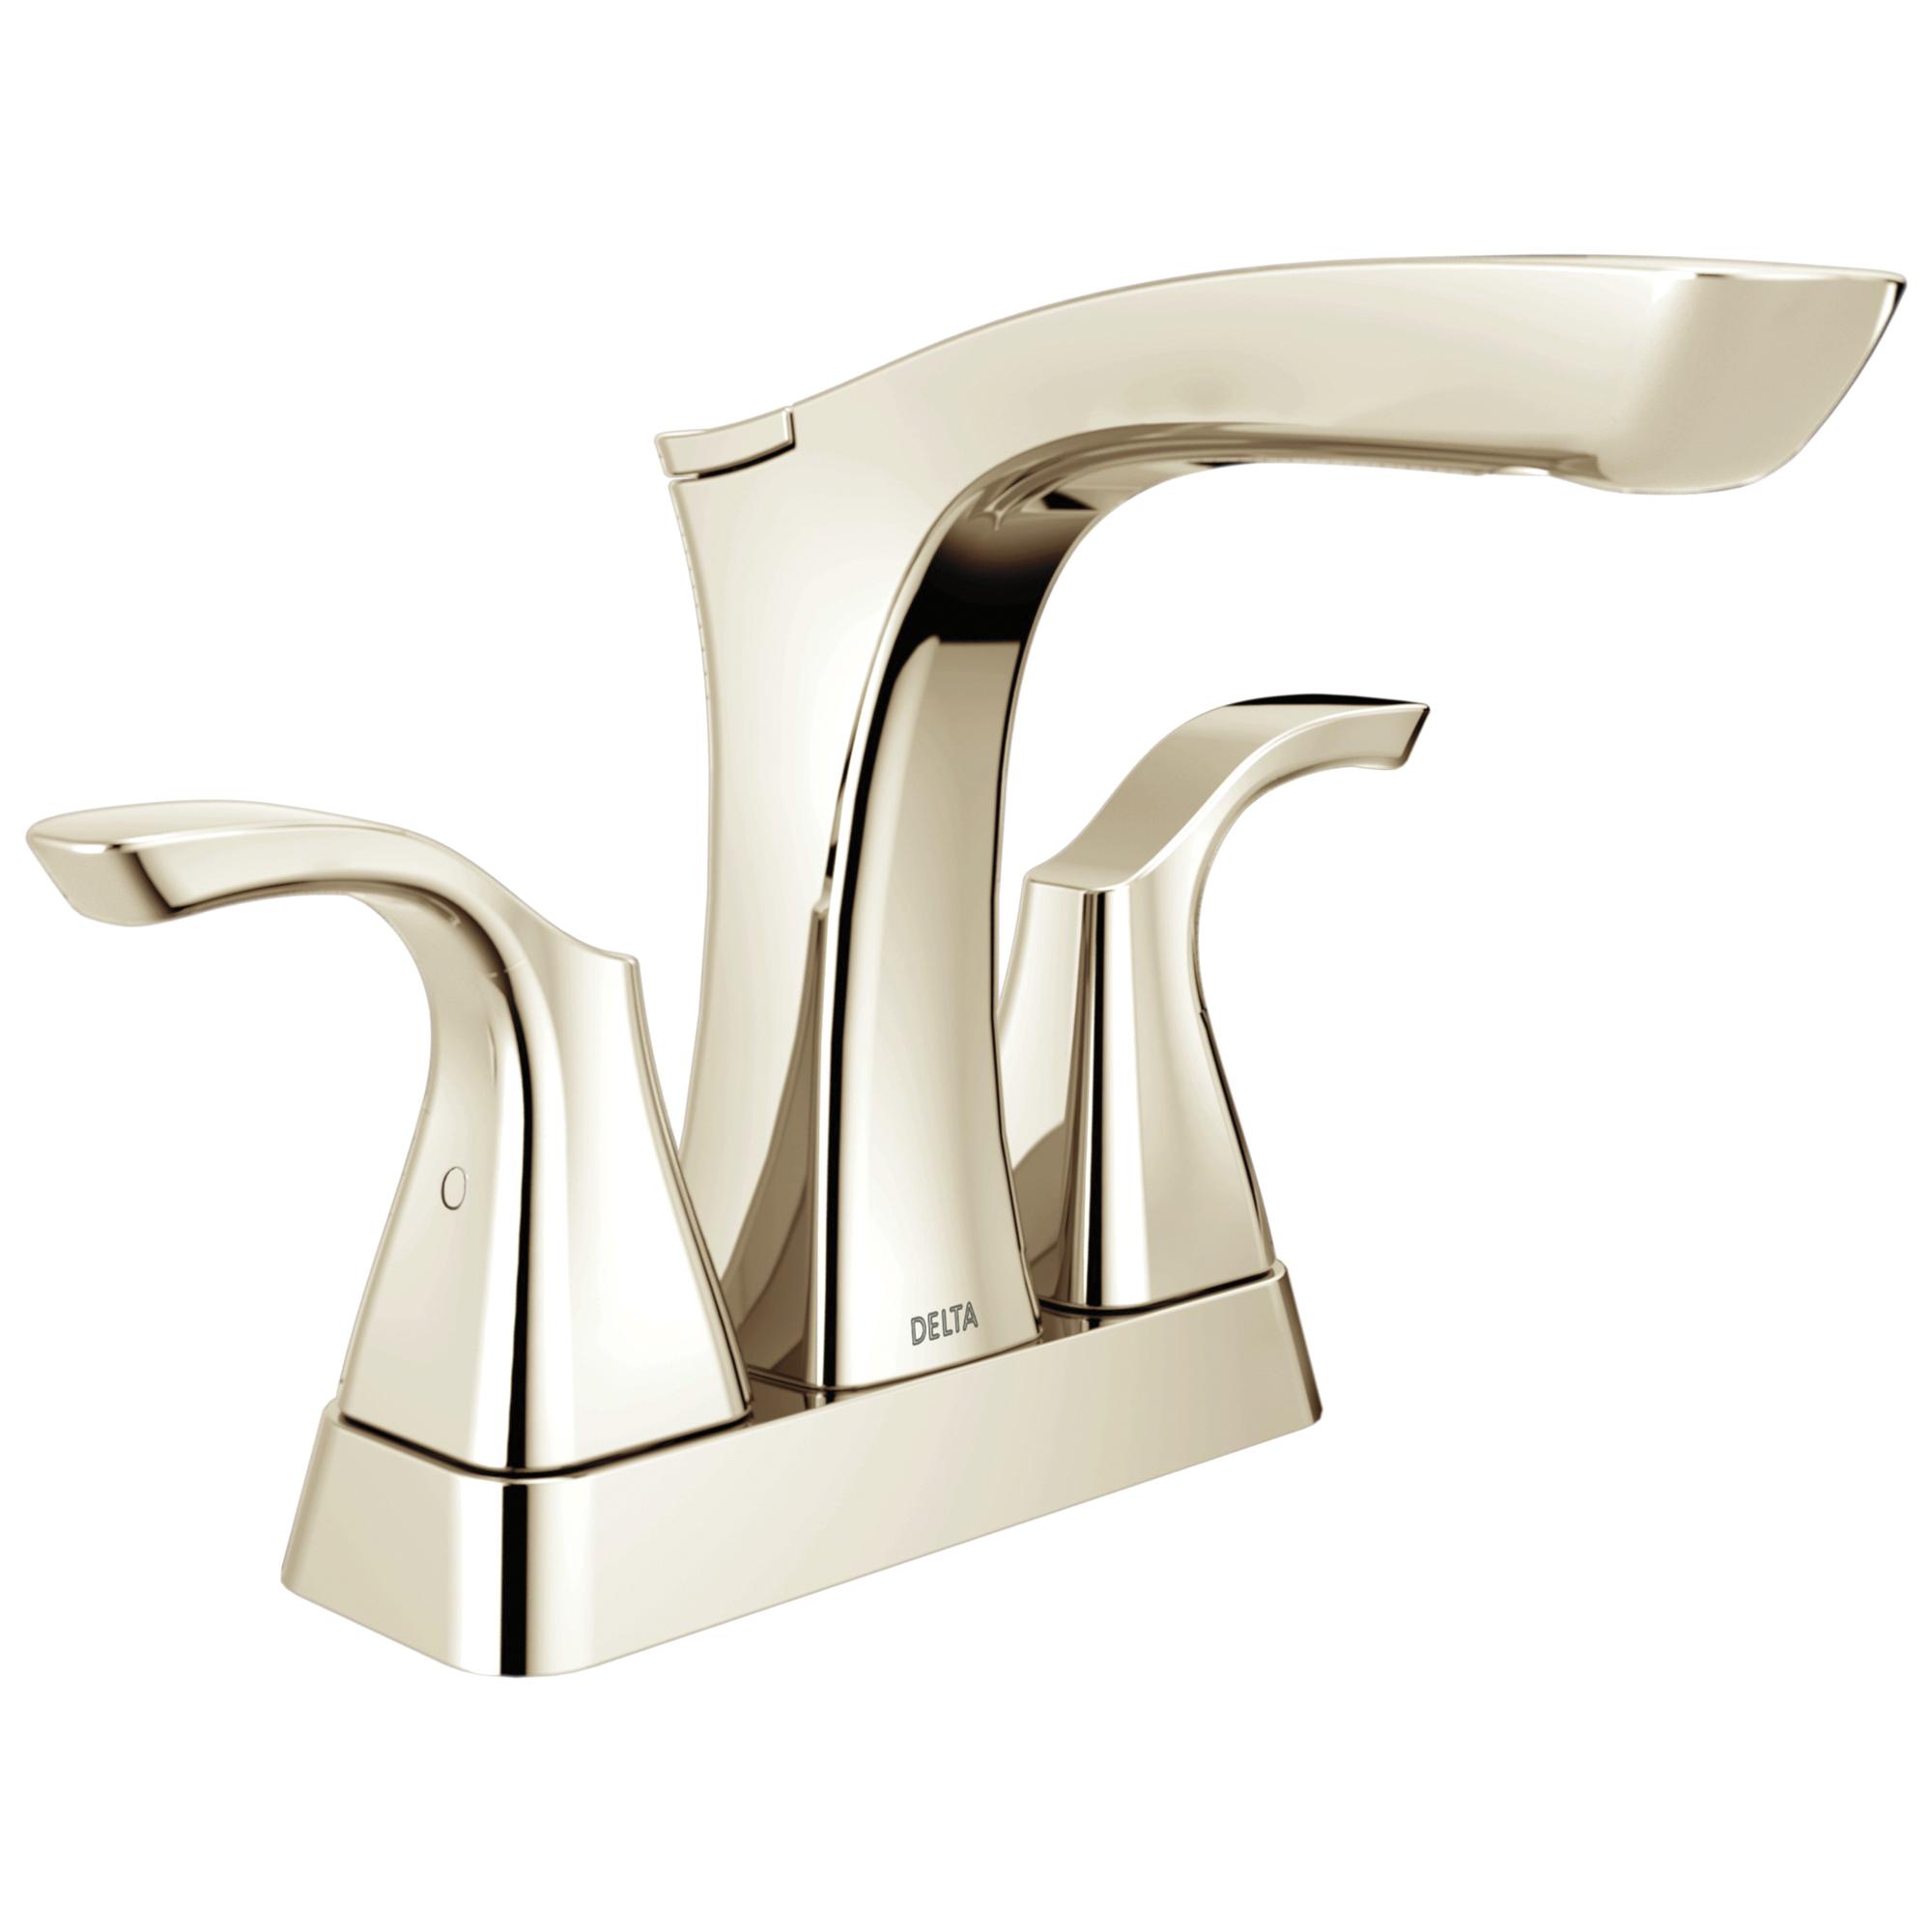 DELTA® 2552-PNMPU-DST Centerset Lavatory Faucet, Tesla®, Polished Nickel, 2 Handles, Metal Pop-Up Drain, 1.2 gpm